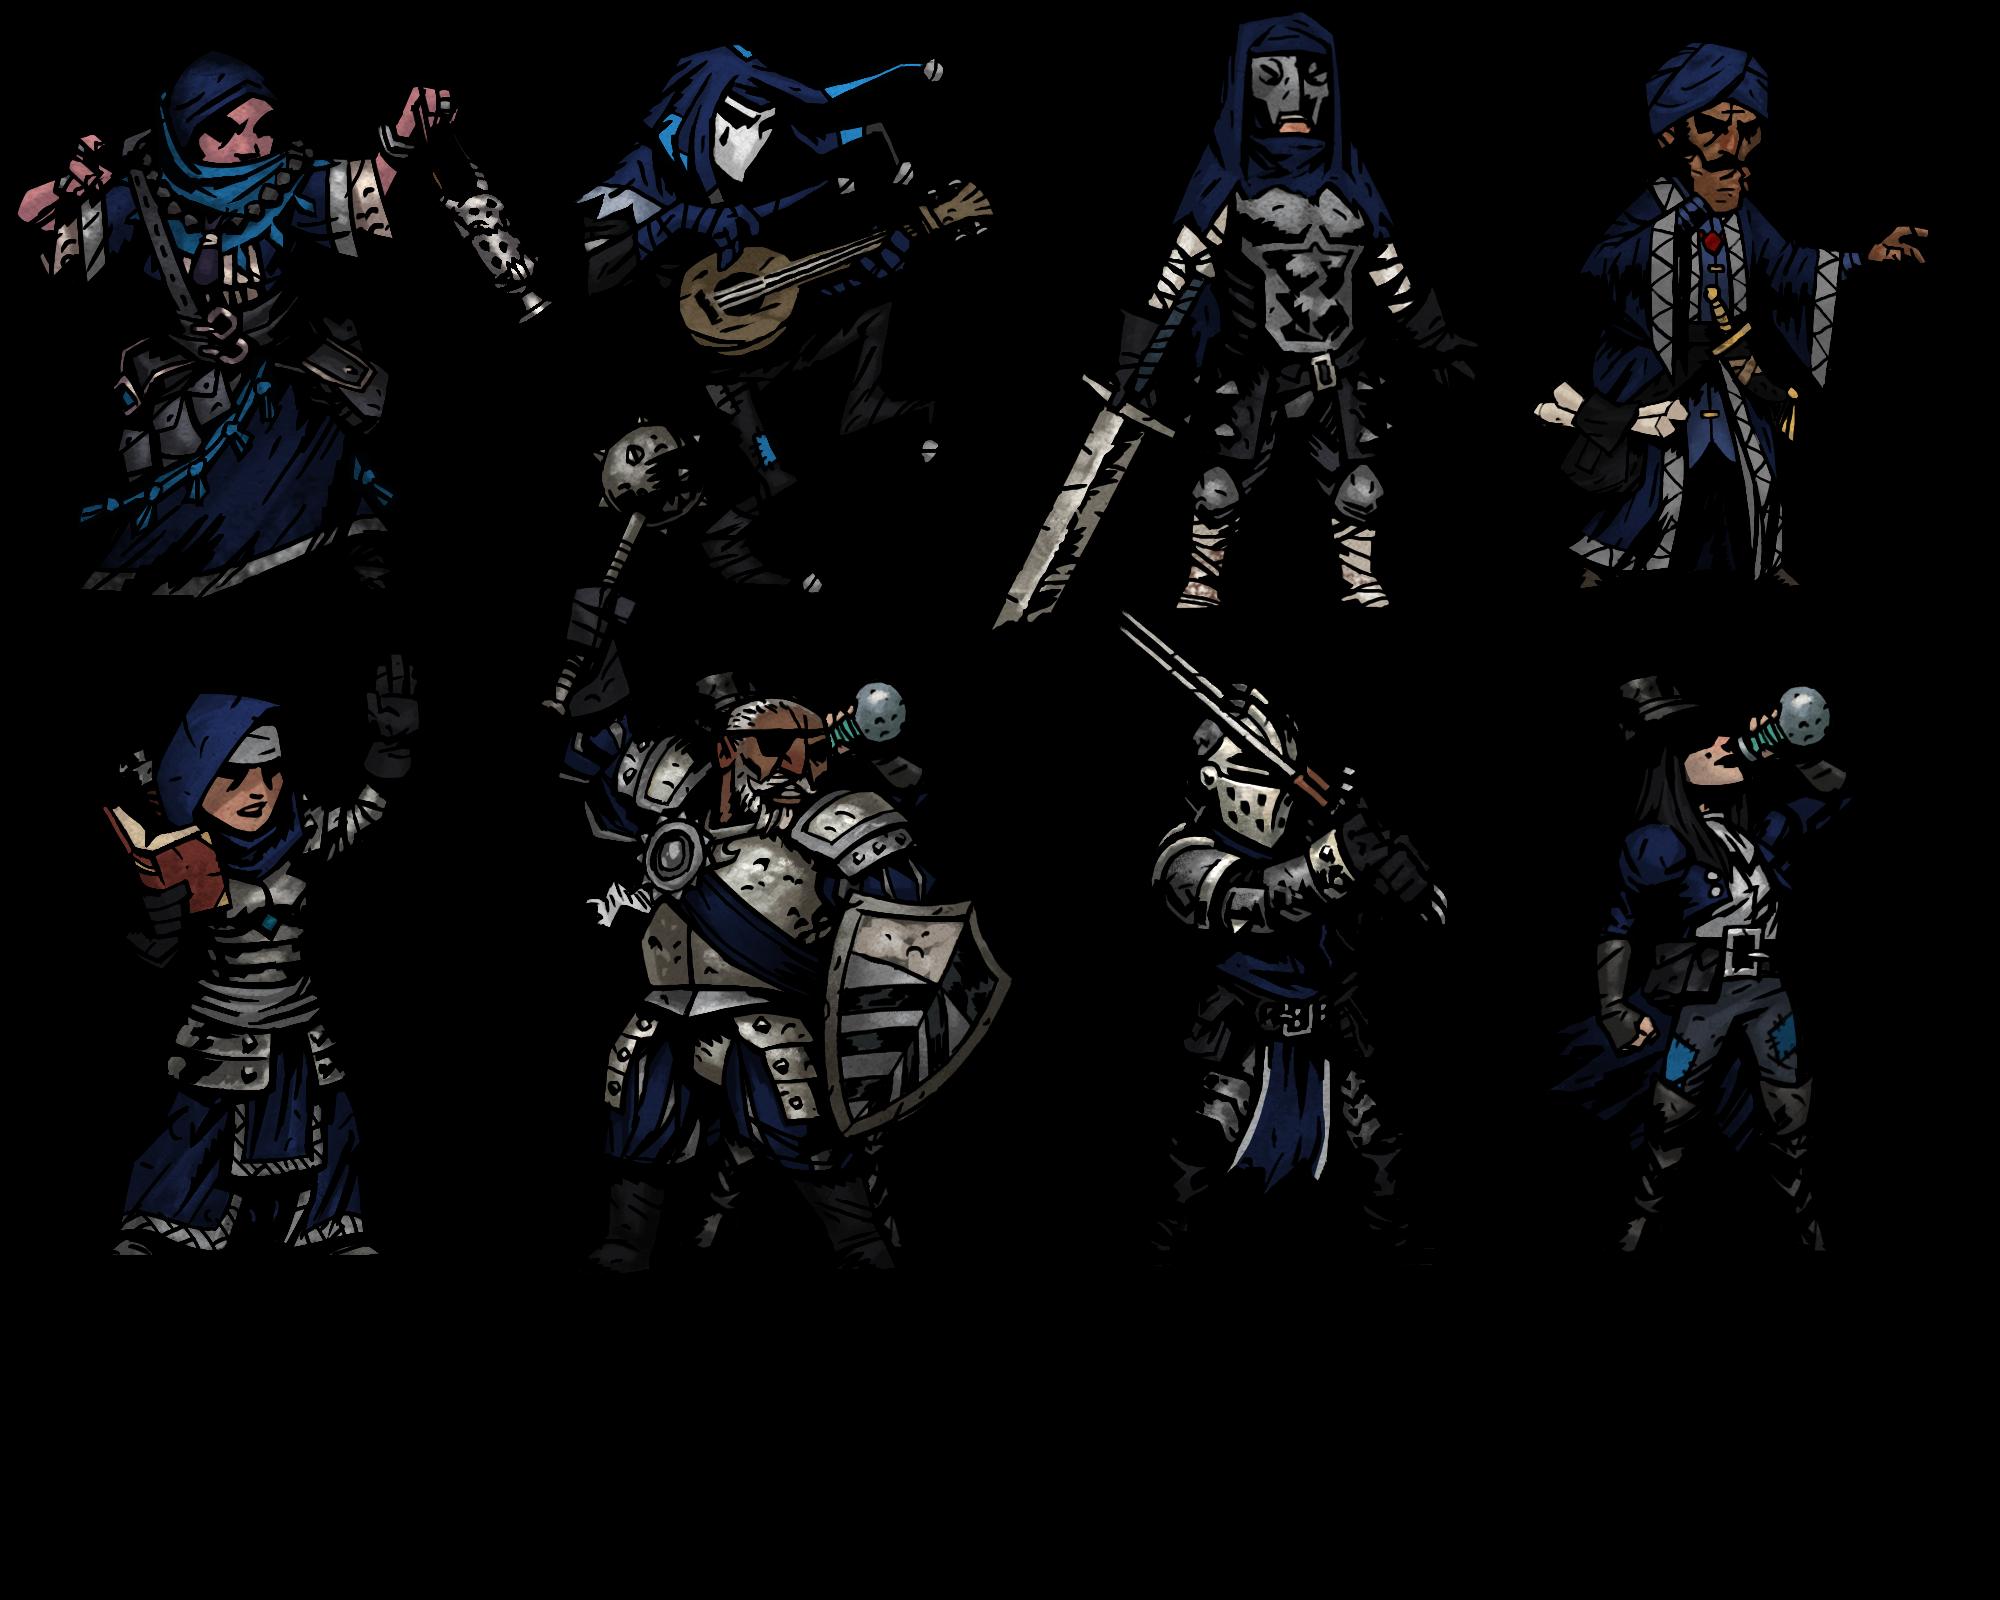 Https Staticdelivery Nexusmods Com Mods 804 Images 120 0 1458342687 Png Darkest Dungeon Silver Outfits Blue And Silver Последние твиты от darkest dungeon (@darkestdungeon). pinterest